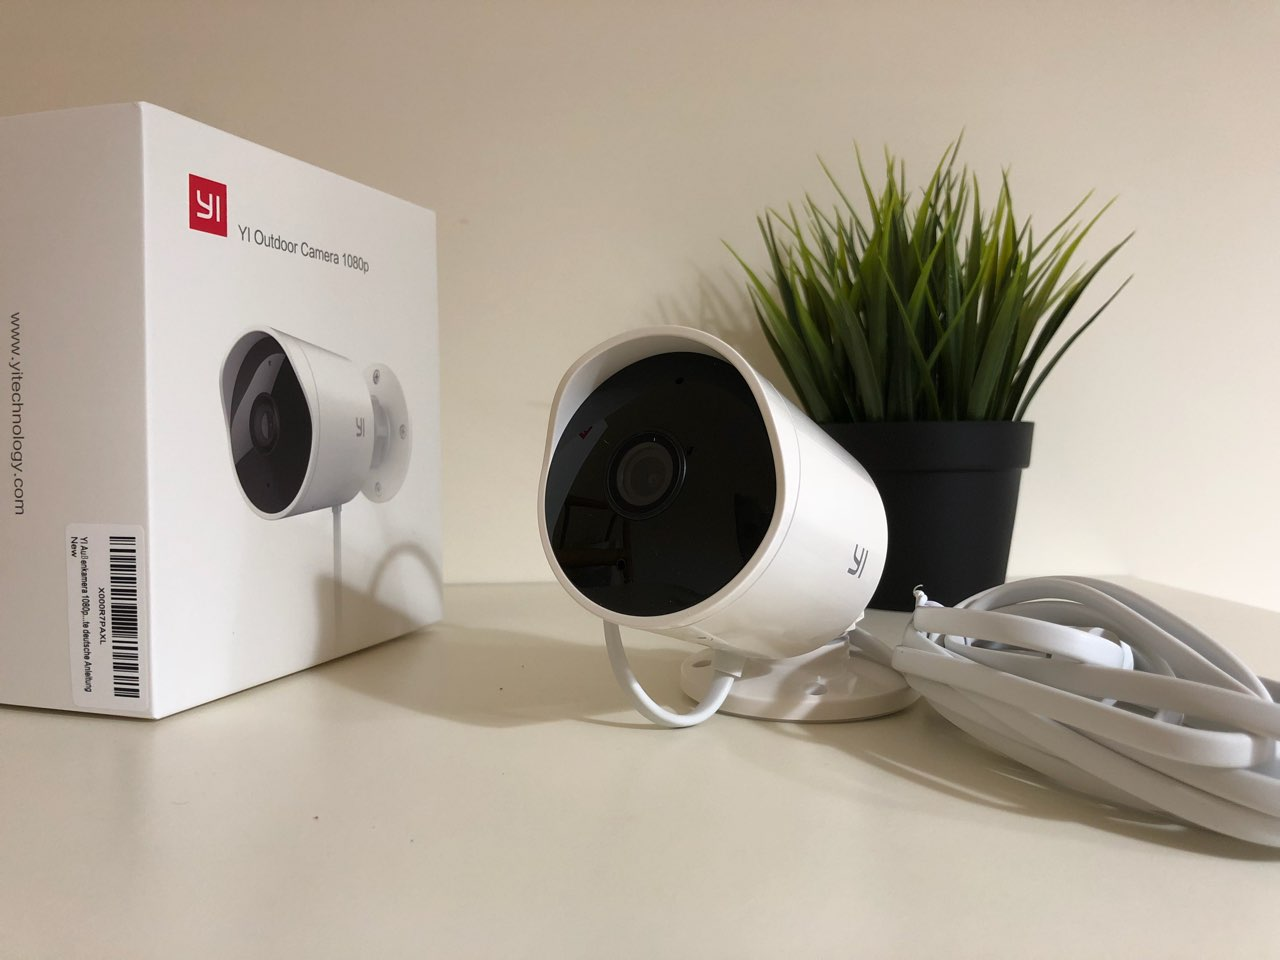 Recensione yi outdoor camera 1080 telecamera wifi da esterno for Microfono esterno xiaomi yi